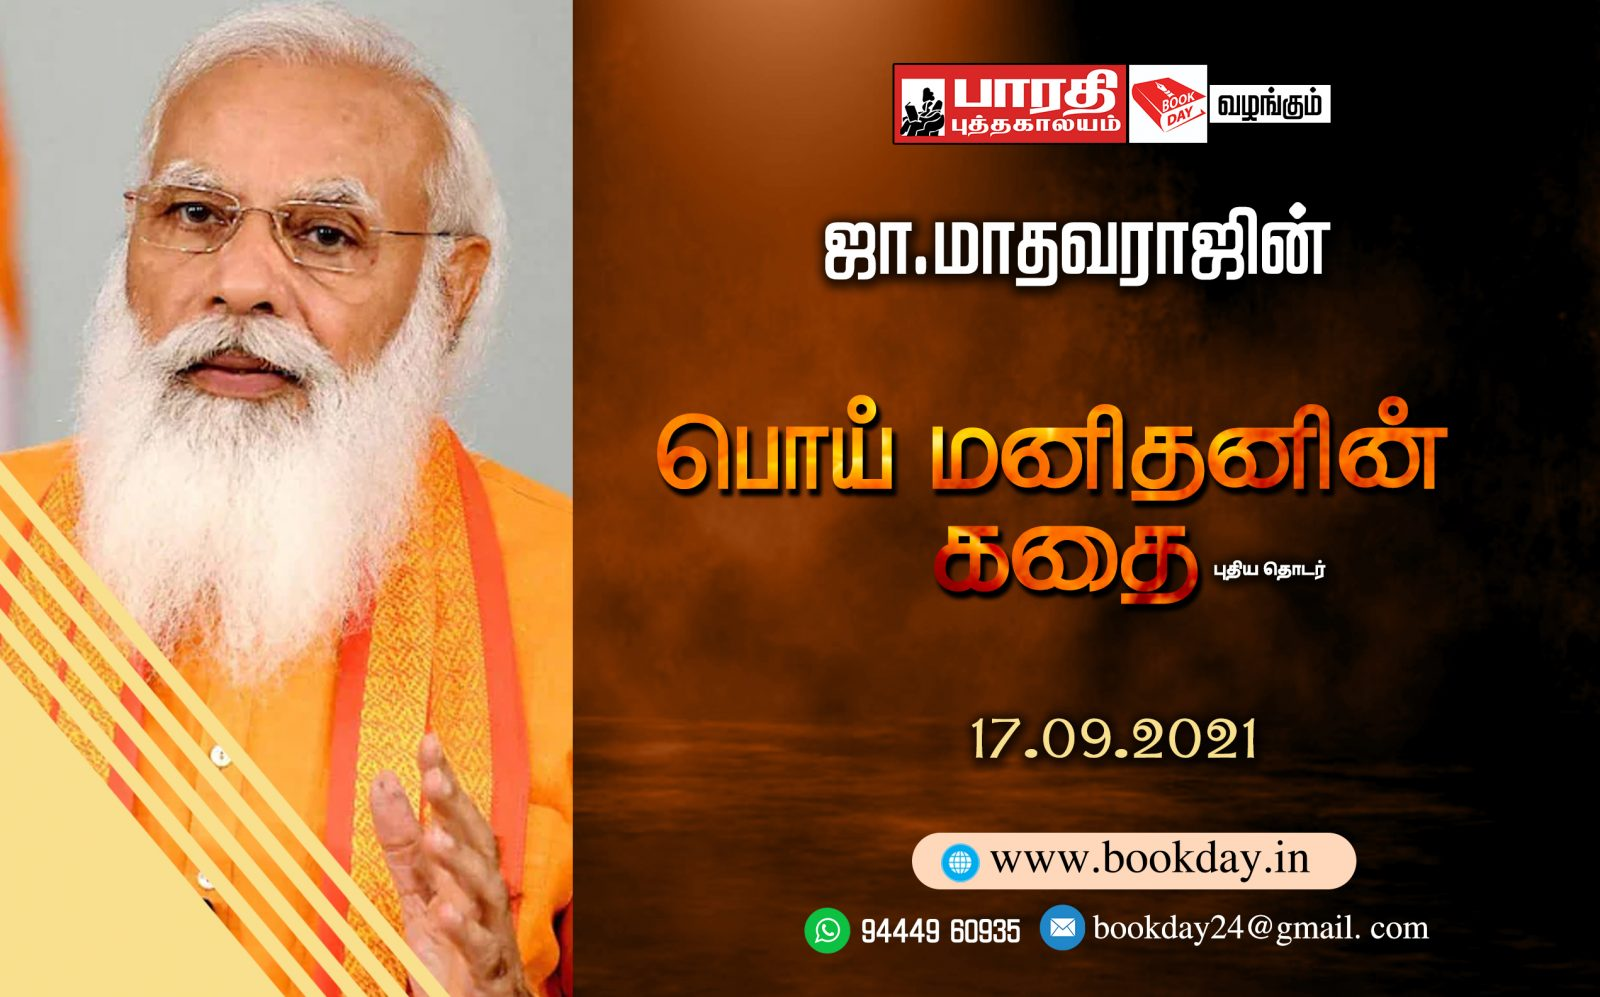 The story of the lying man (பொய் மனிதனின் கதை) Web Series By Writer J. Mathavaraj (ஜா. மாதவராஜ்). Book Day is Branch of Bharathi Puthakalayam